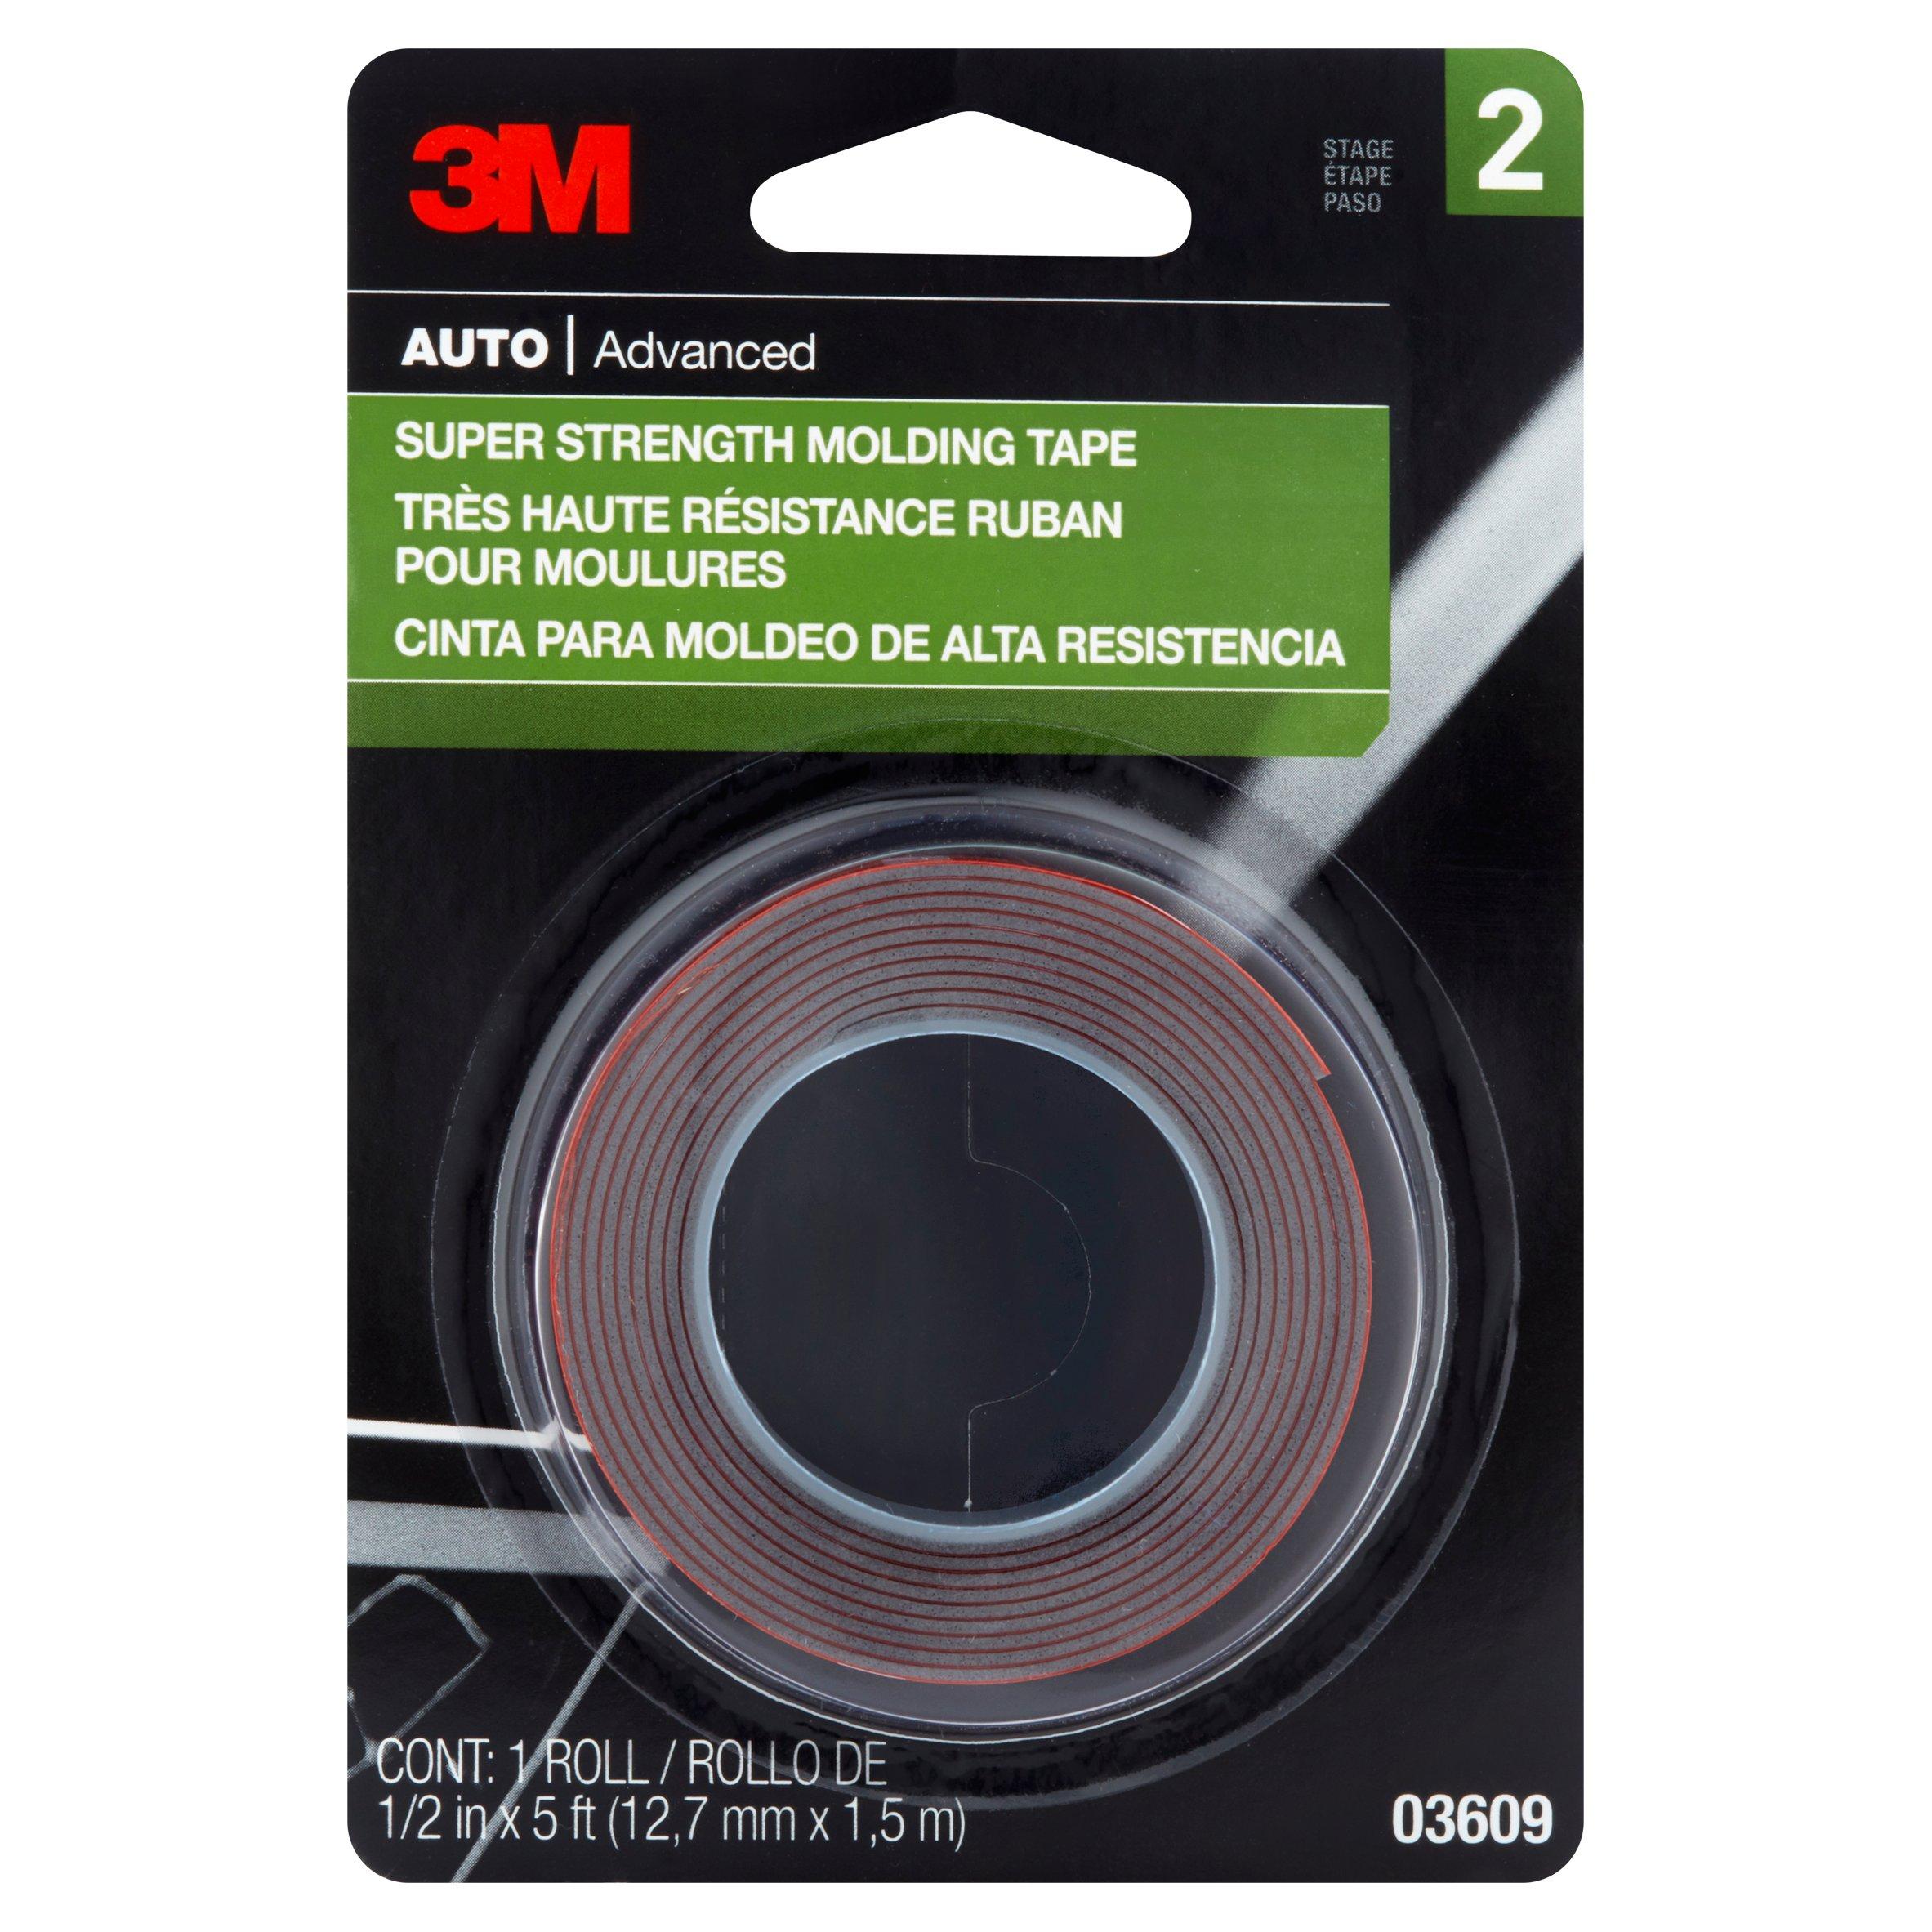 3m Super Strength Molding Tape 1 2 In X 5 Ft Walmart Com